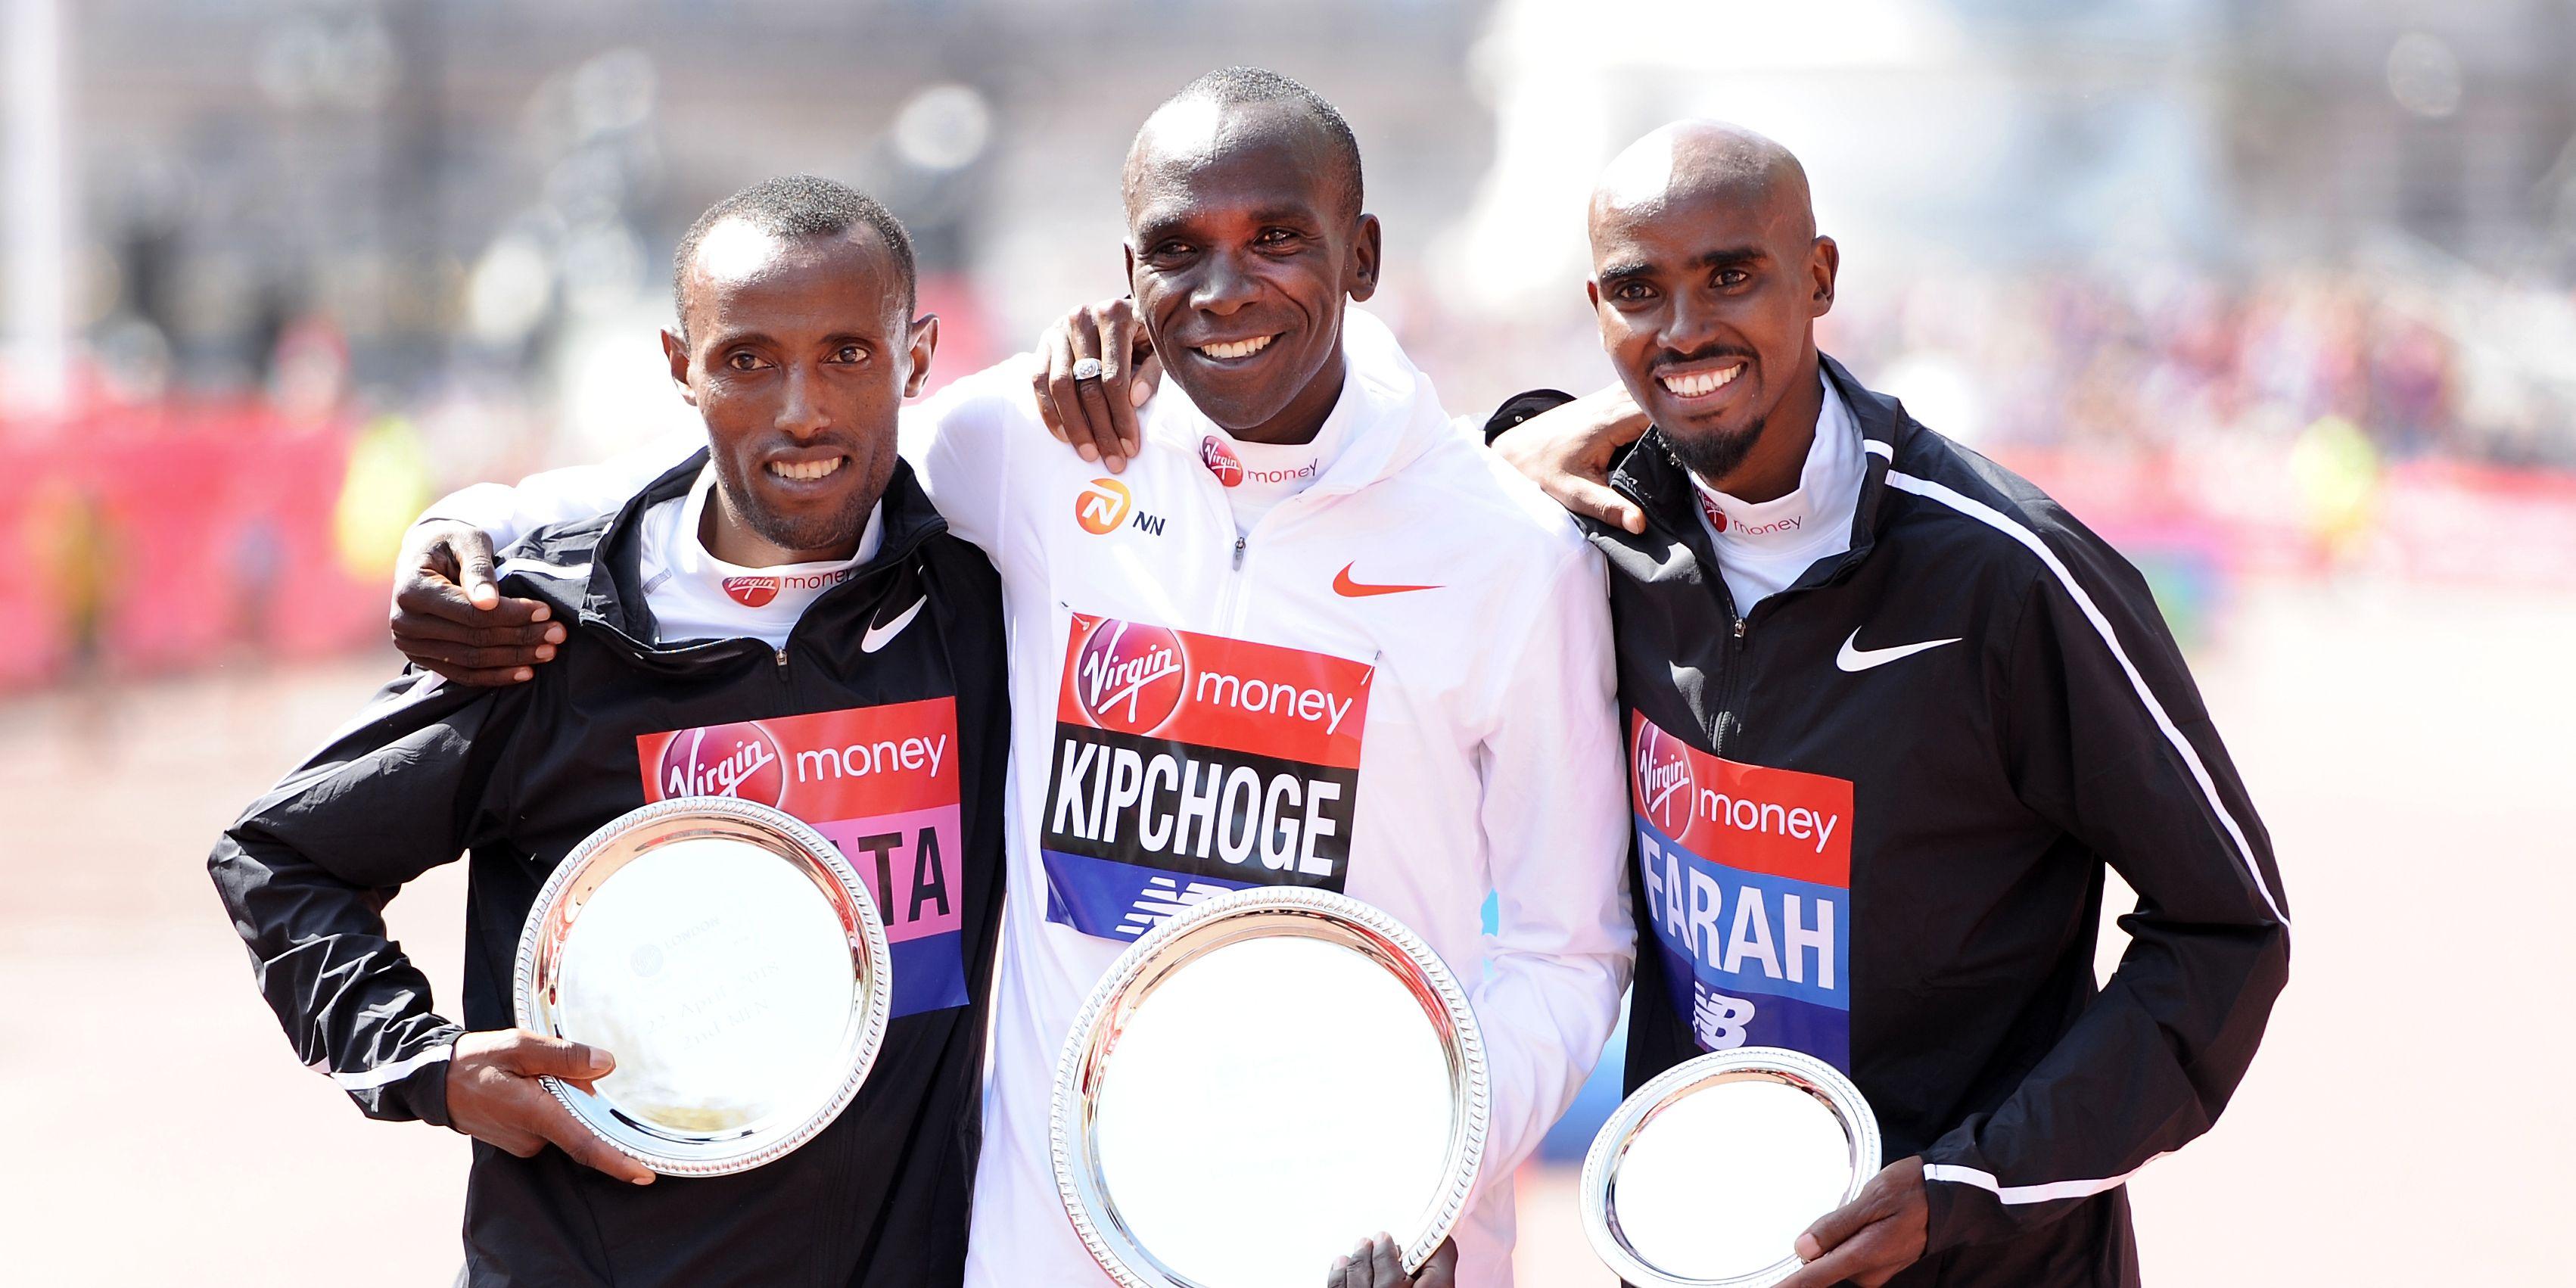 The Virgin London Marathon